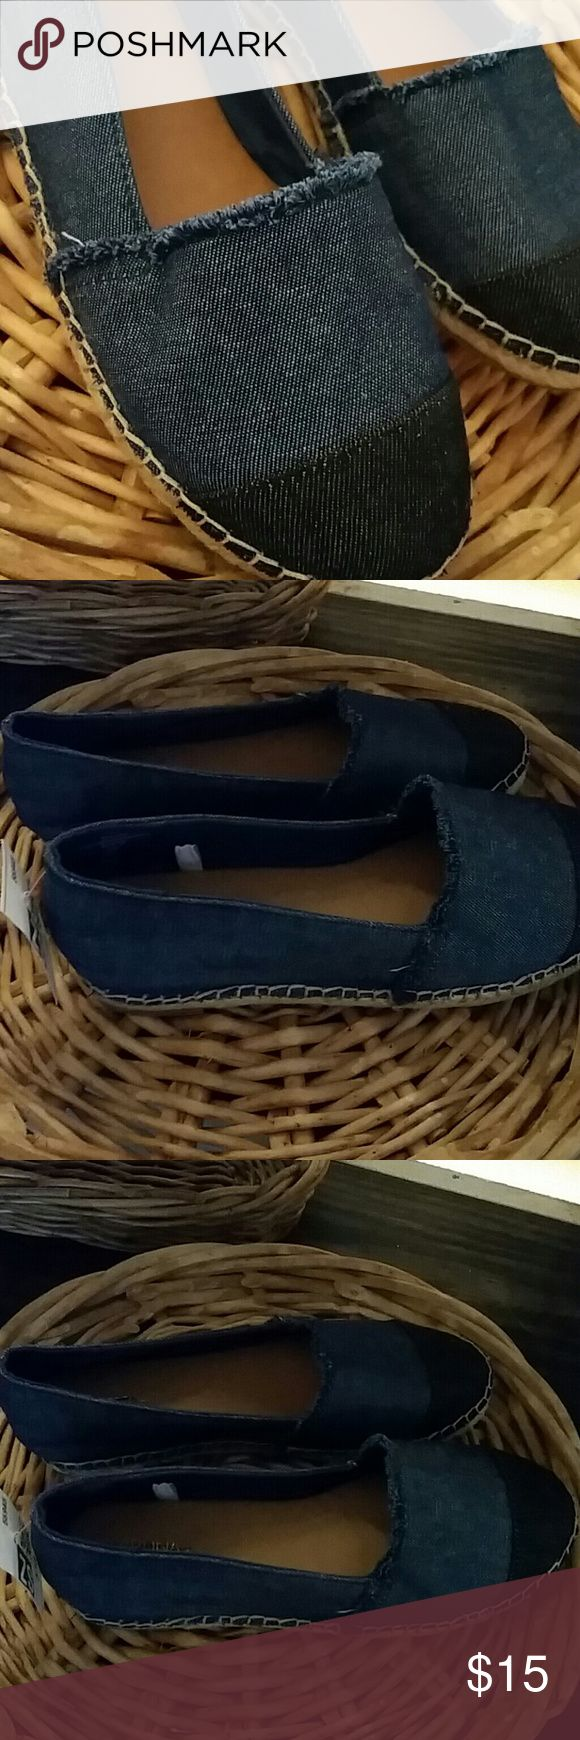 Merona Denim Espadrilles Shoe New with out box. Merona Shoes Espadrilles